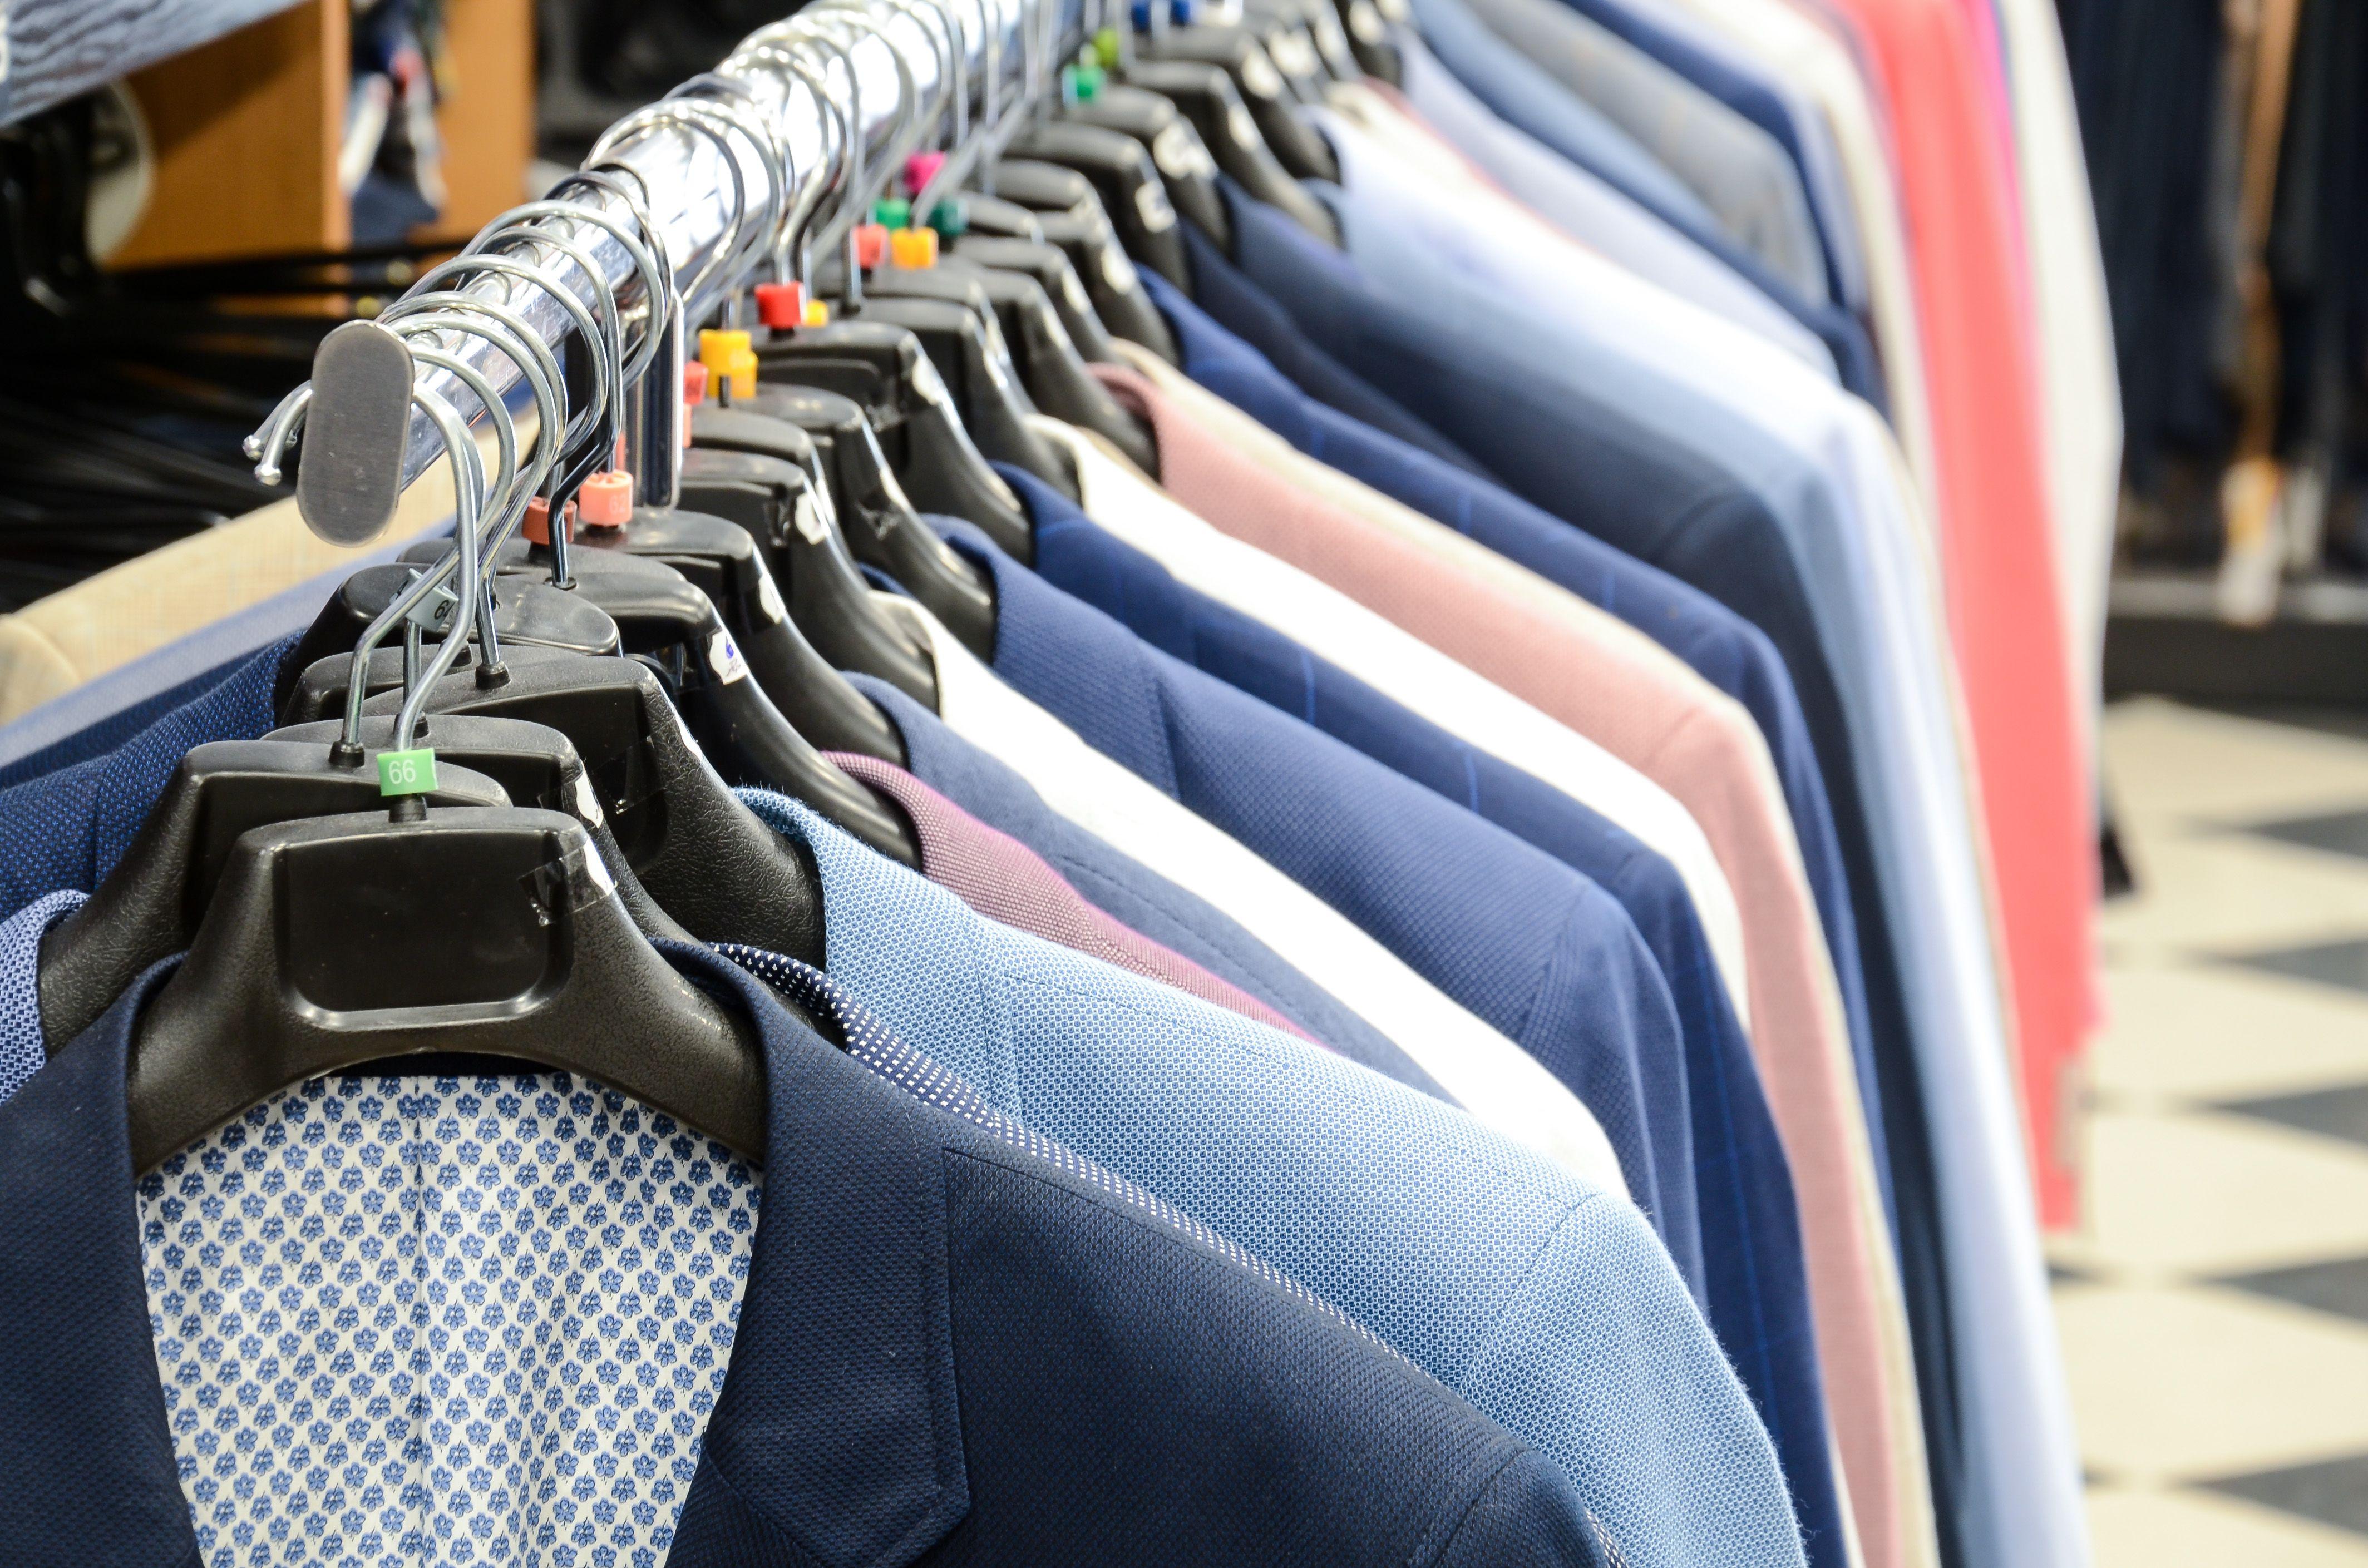 b1e105fb527ce Foto 5 de Tiendas de ropa de hombre en Totana